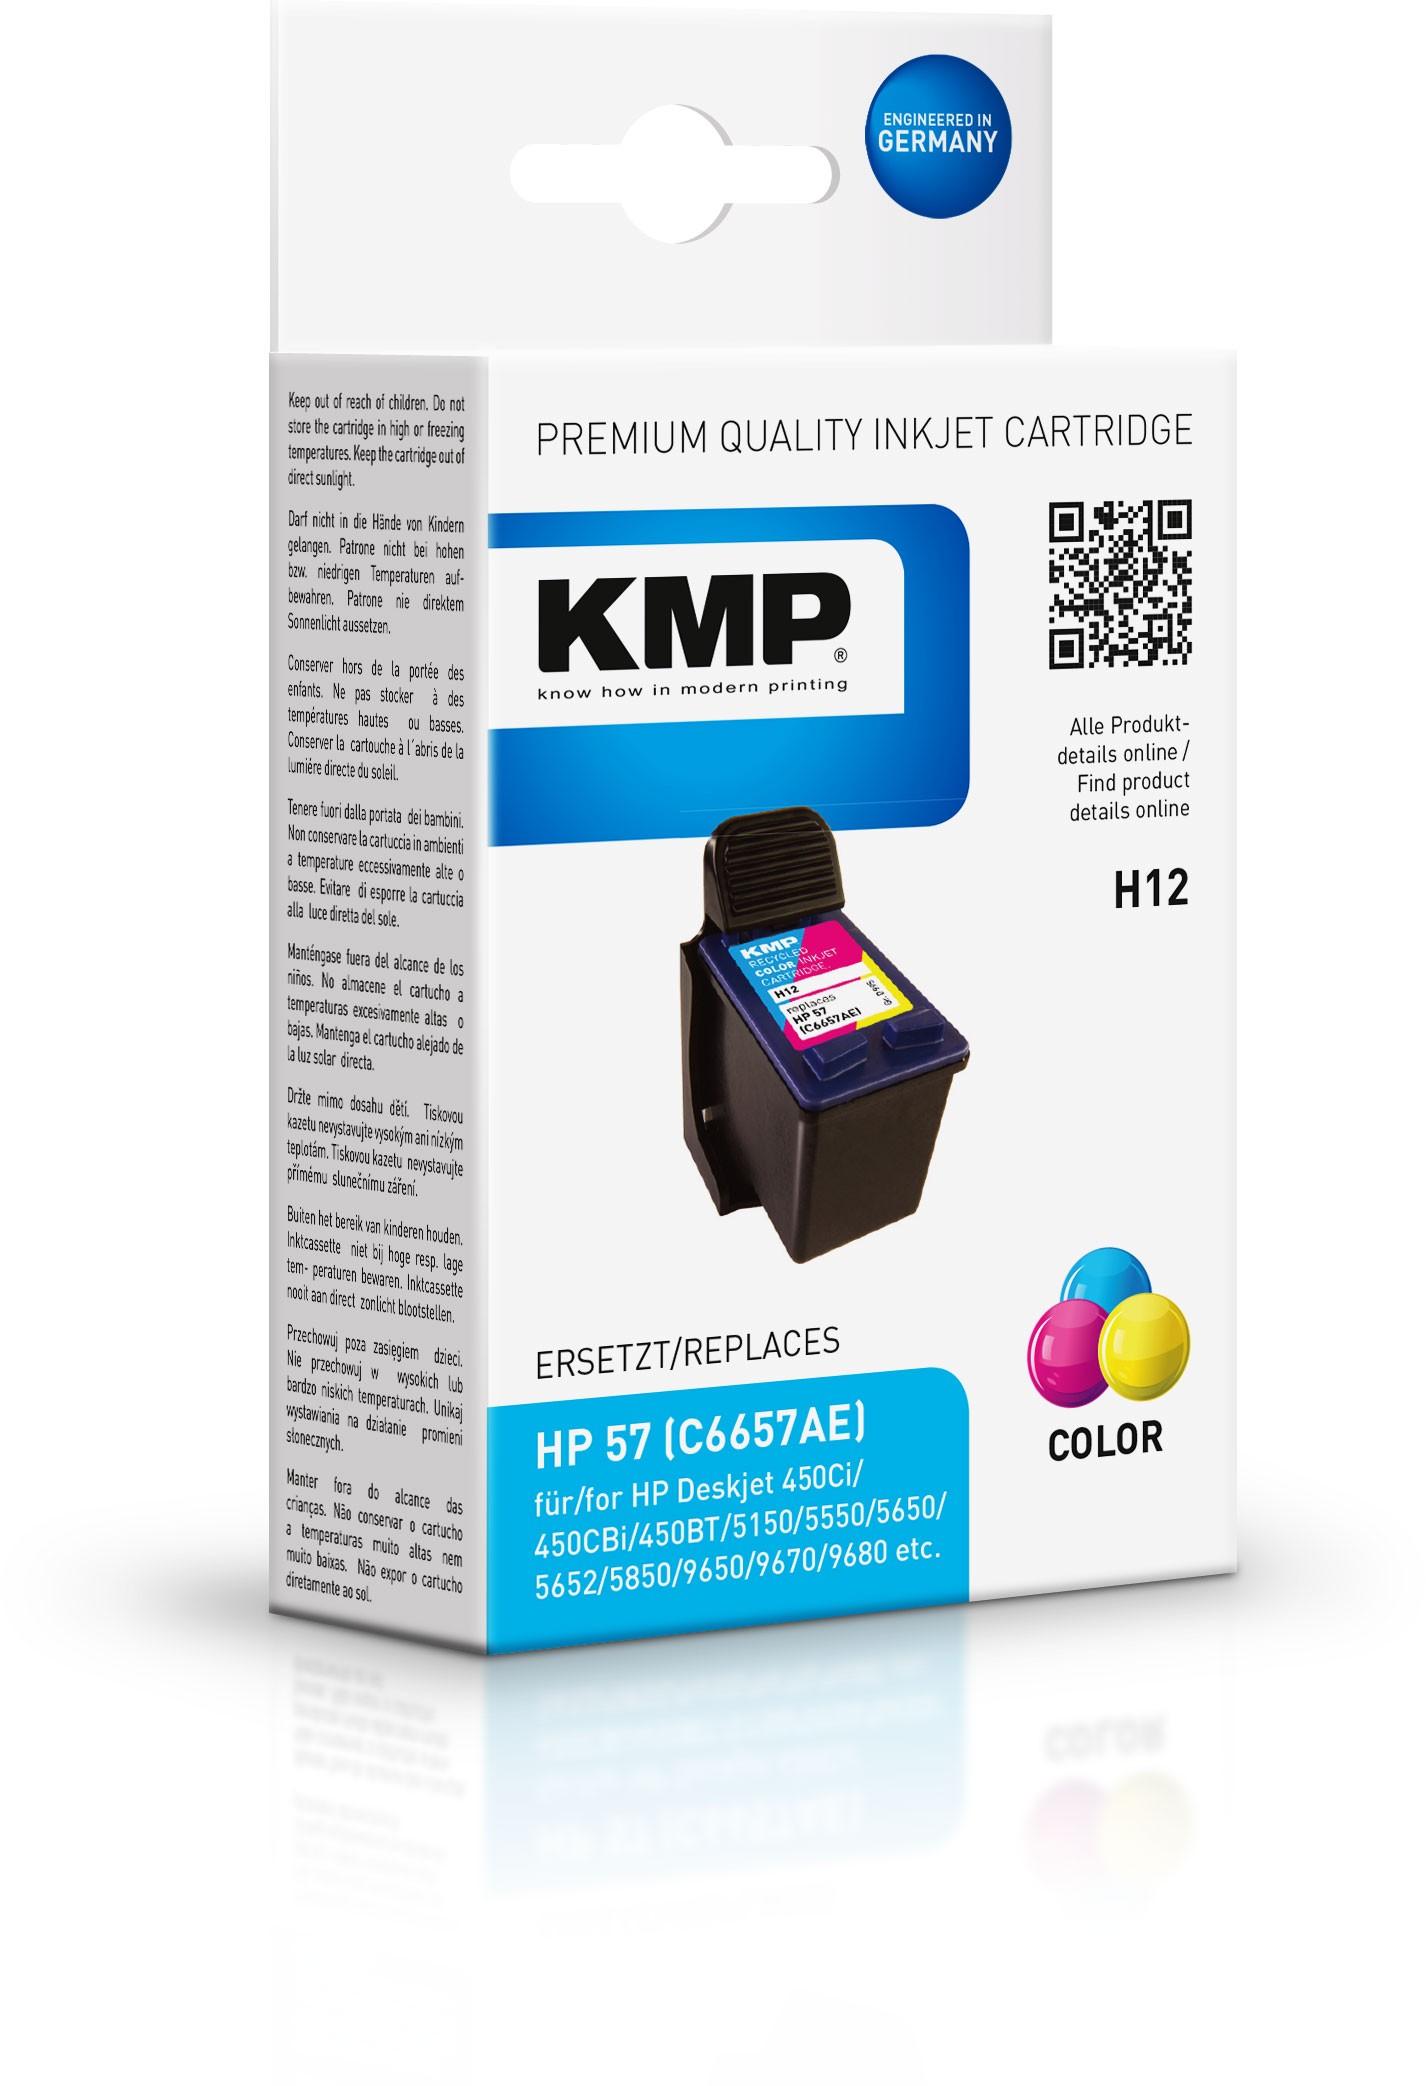 Vorschau: KMP Patrone H12 komp. zu HP 57 C6657AE DeskJet 5550 5850 color